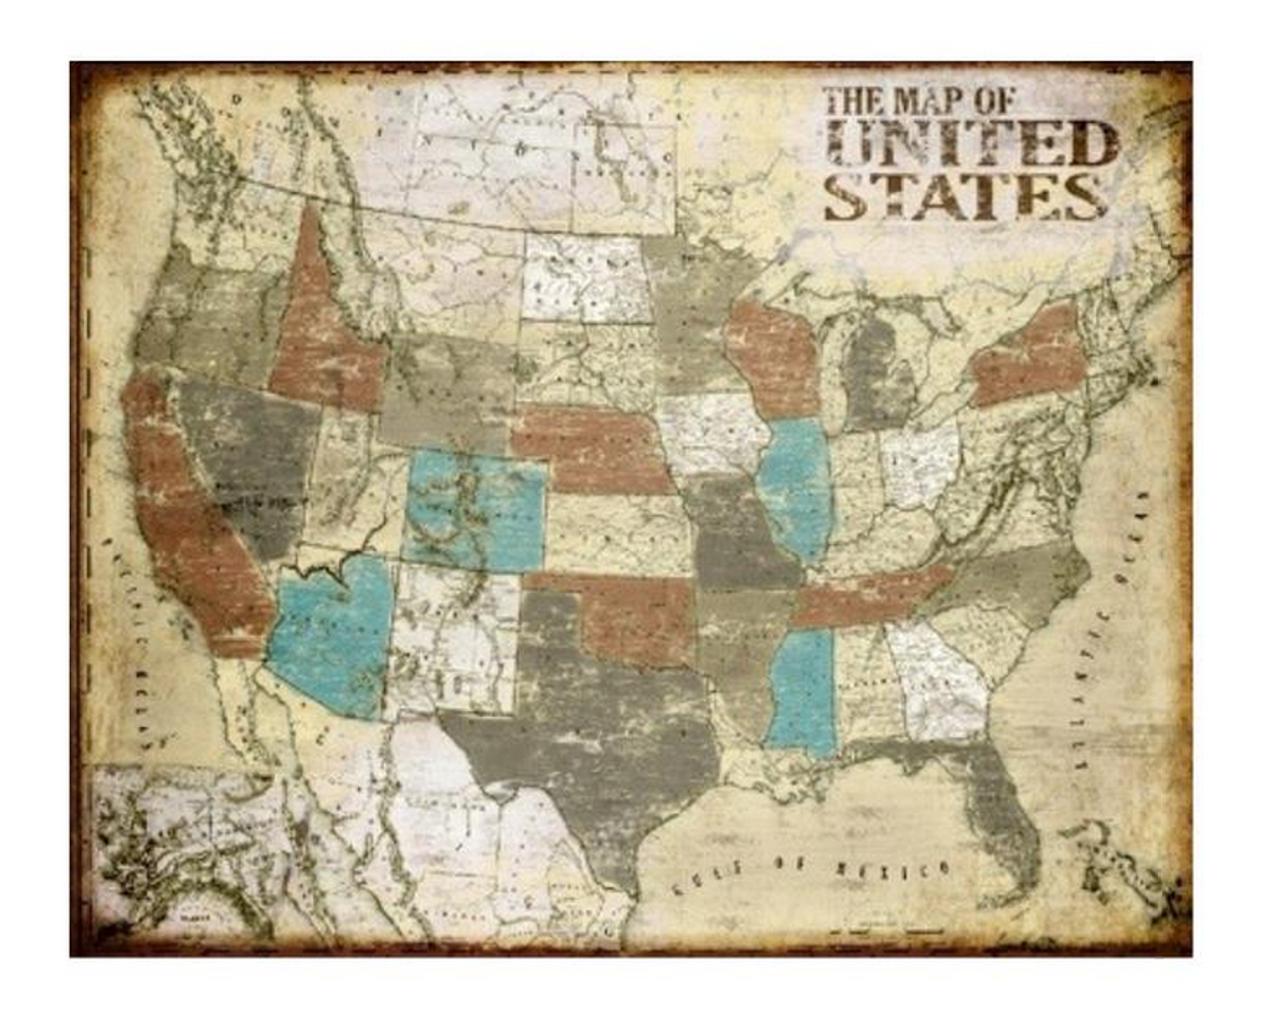 Vintage US Map Zin Home - Vintage us map